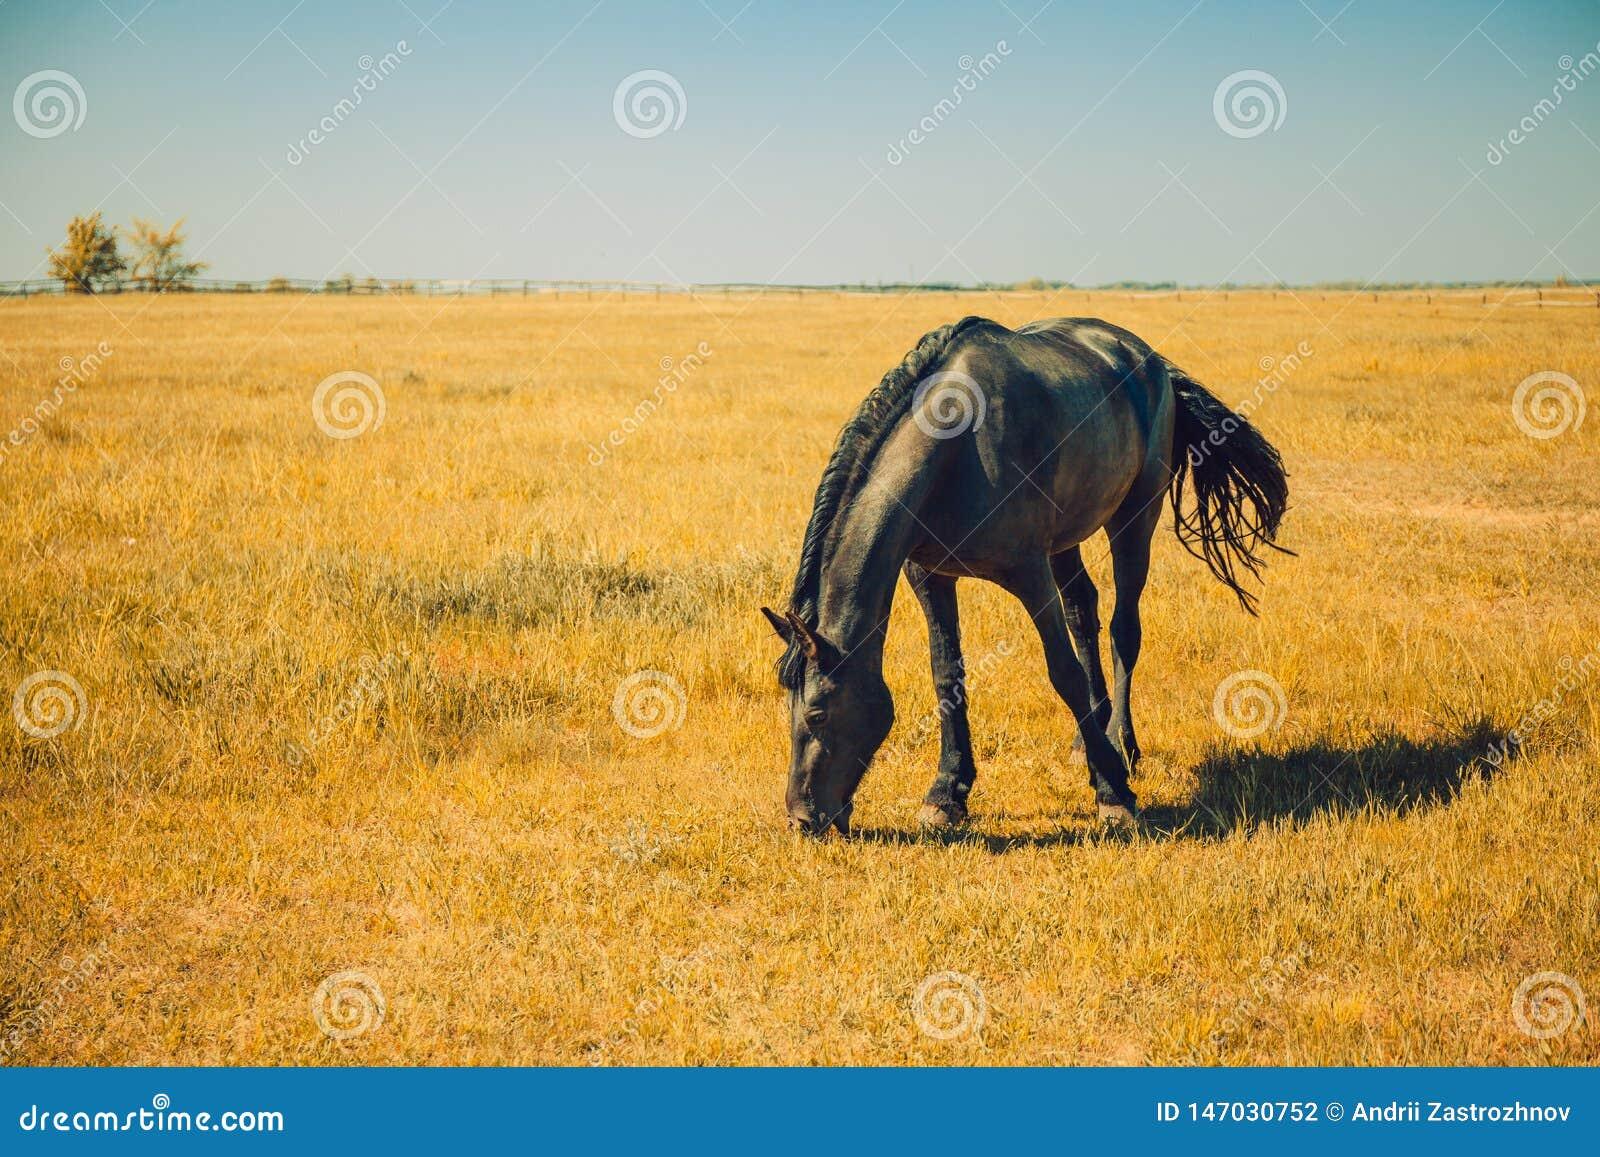 Breed horse farm, equestrian herd